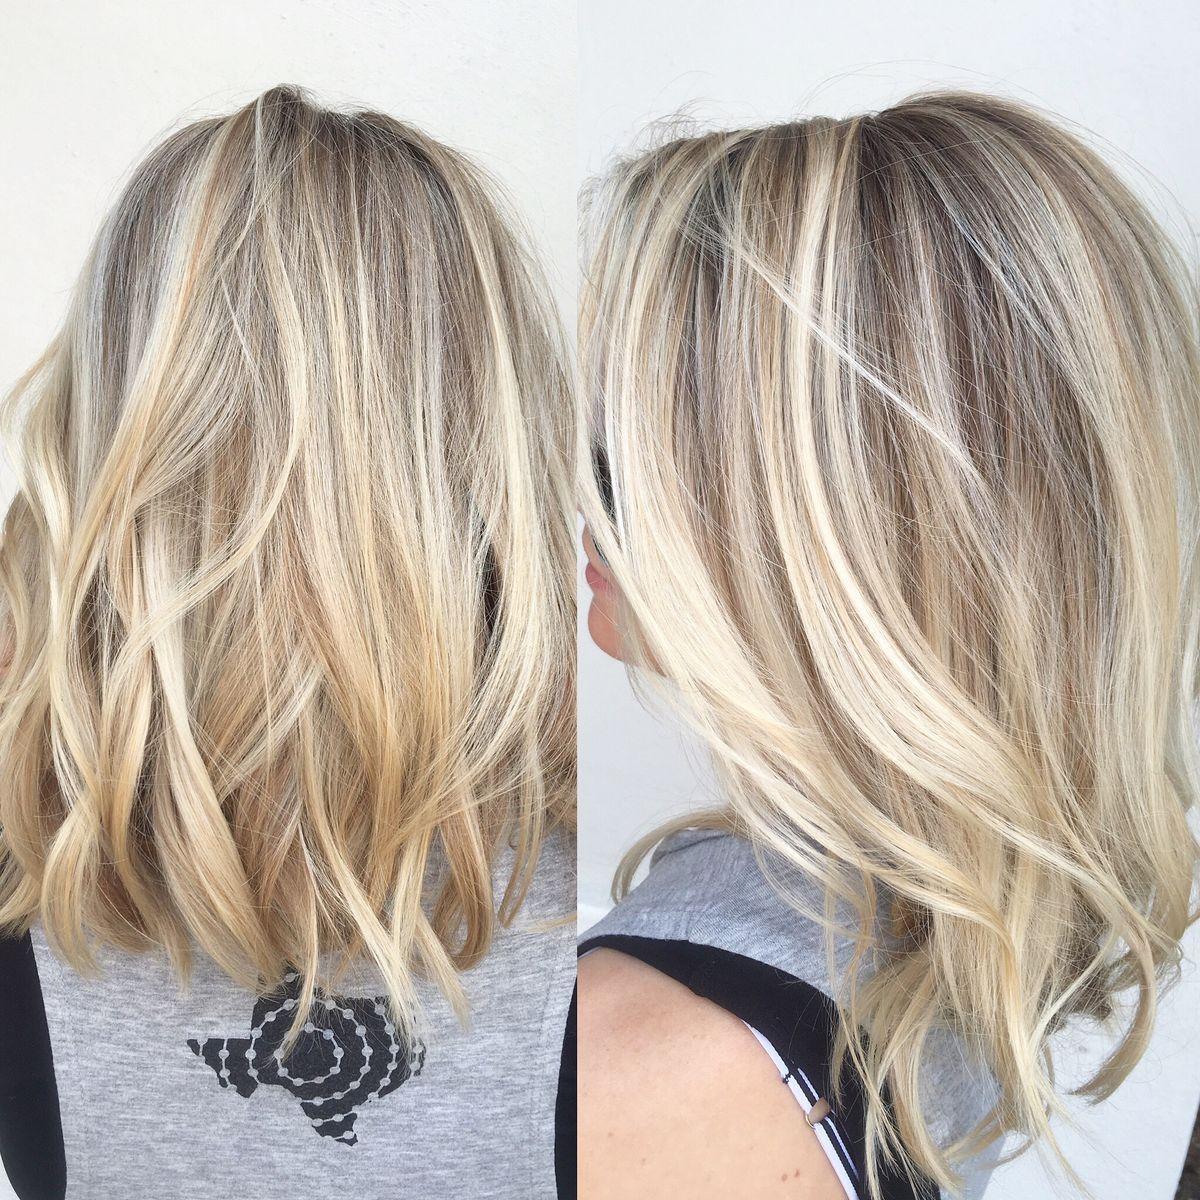 Pin by nicole lustgarten on hair pinterest hair style hair